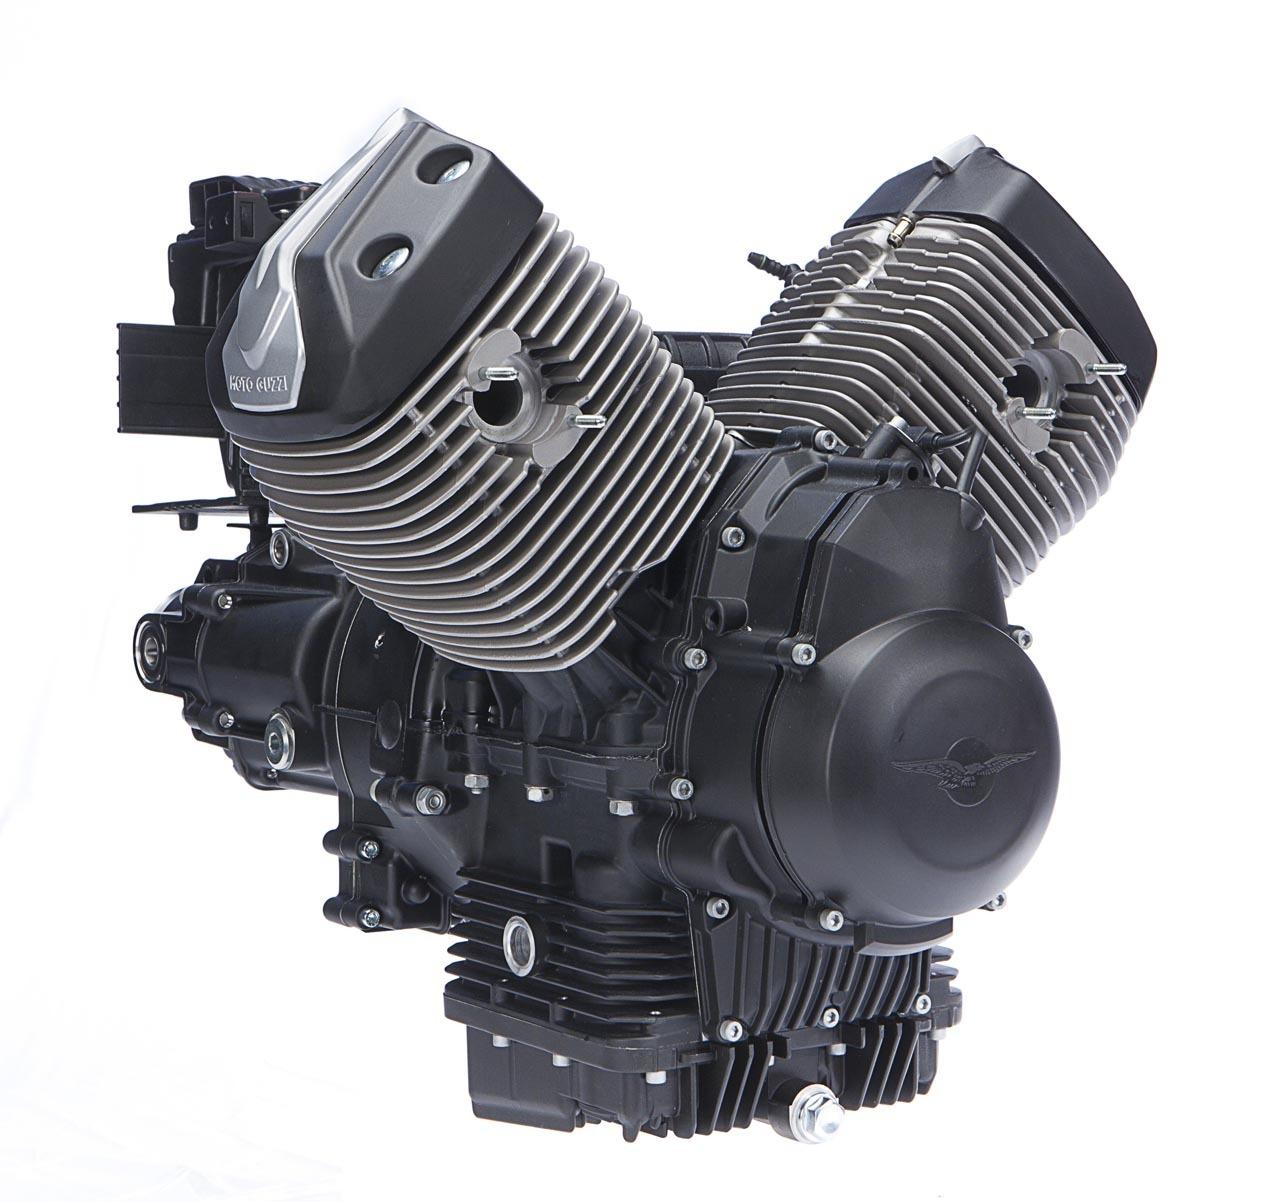 Gama Moto Guzzi V7